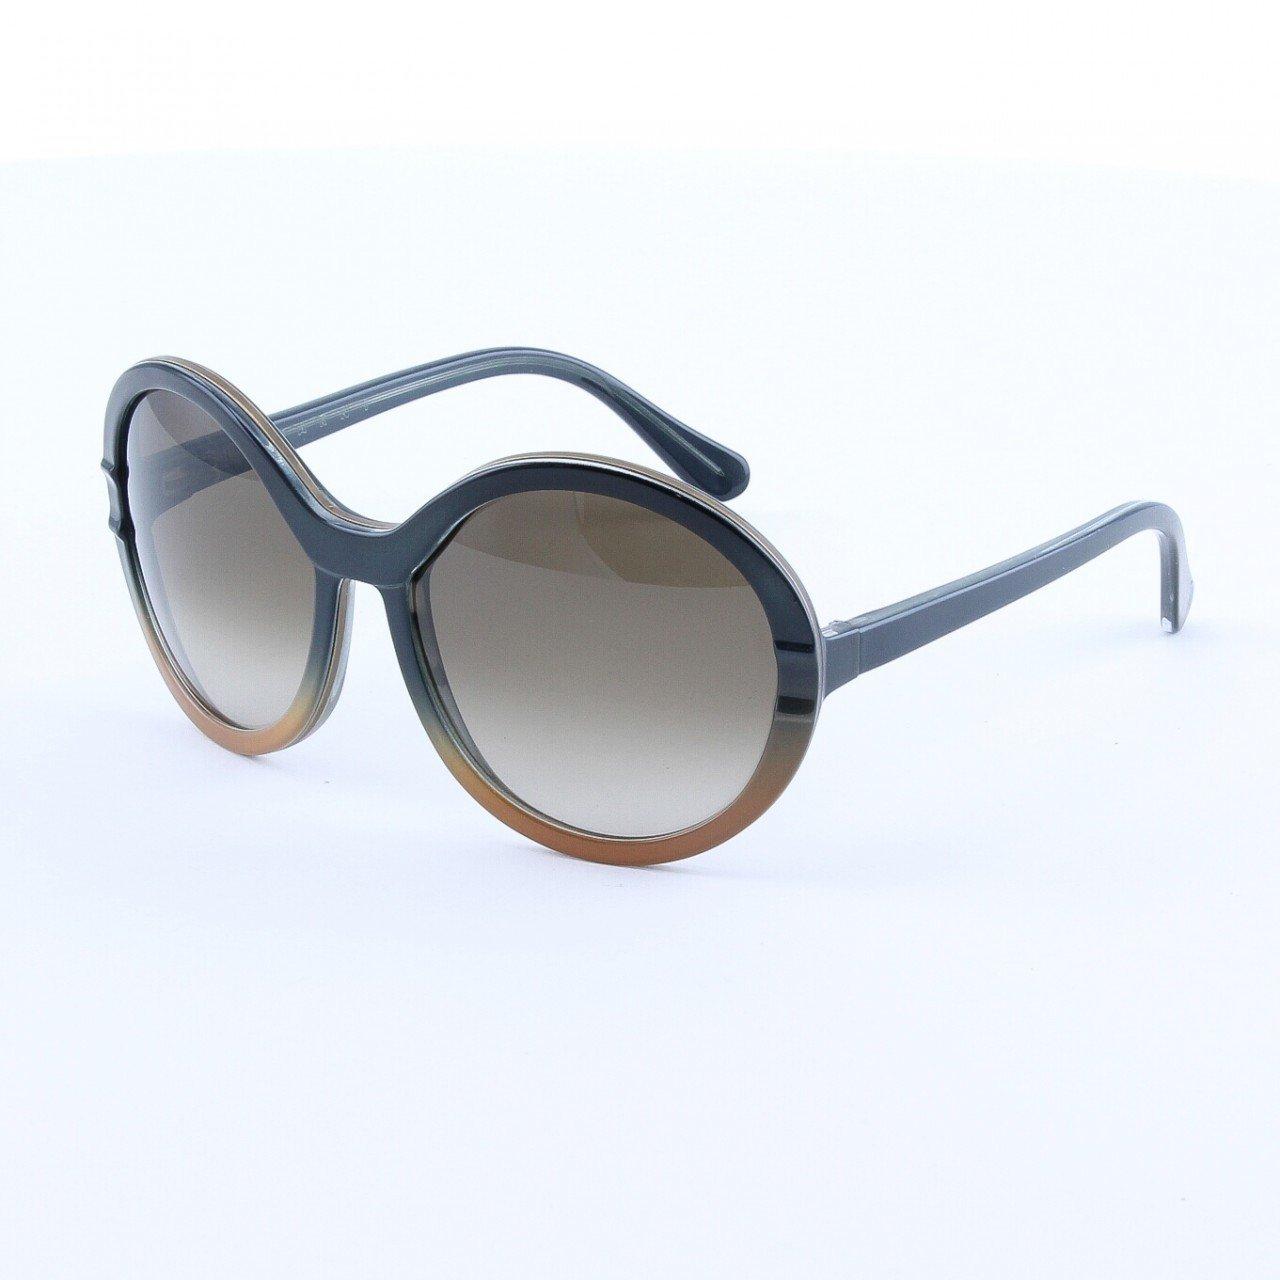 Marni MA145 Sunglasses 05 Deep Charcoal Gray Light Tan, Gray Gradient Lenses